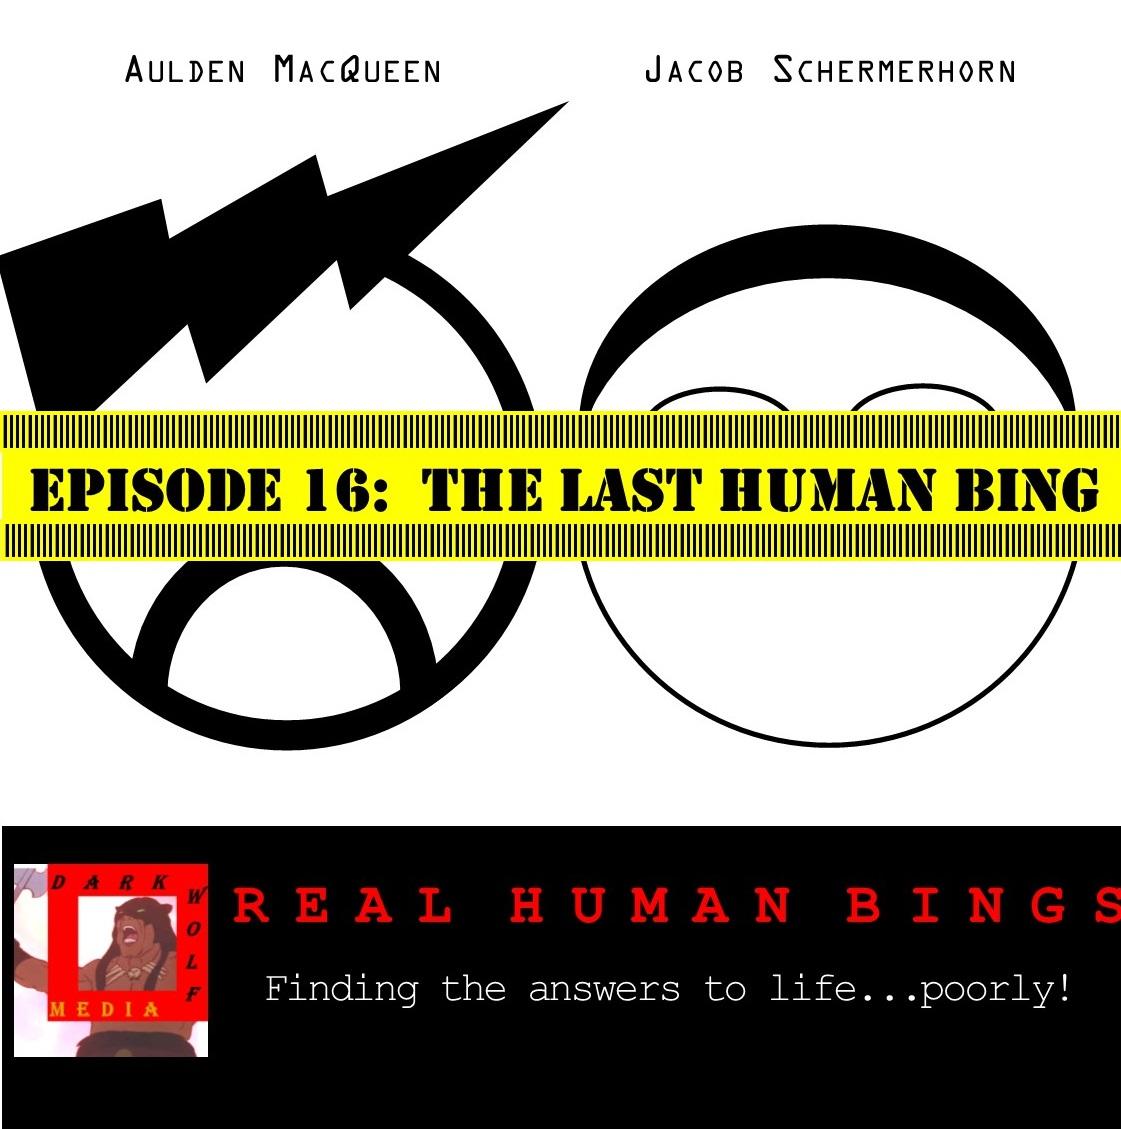 Episode 16 Cover.jpg